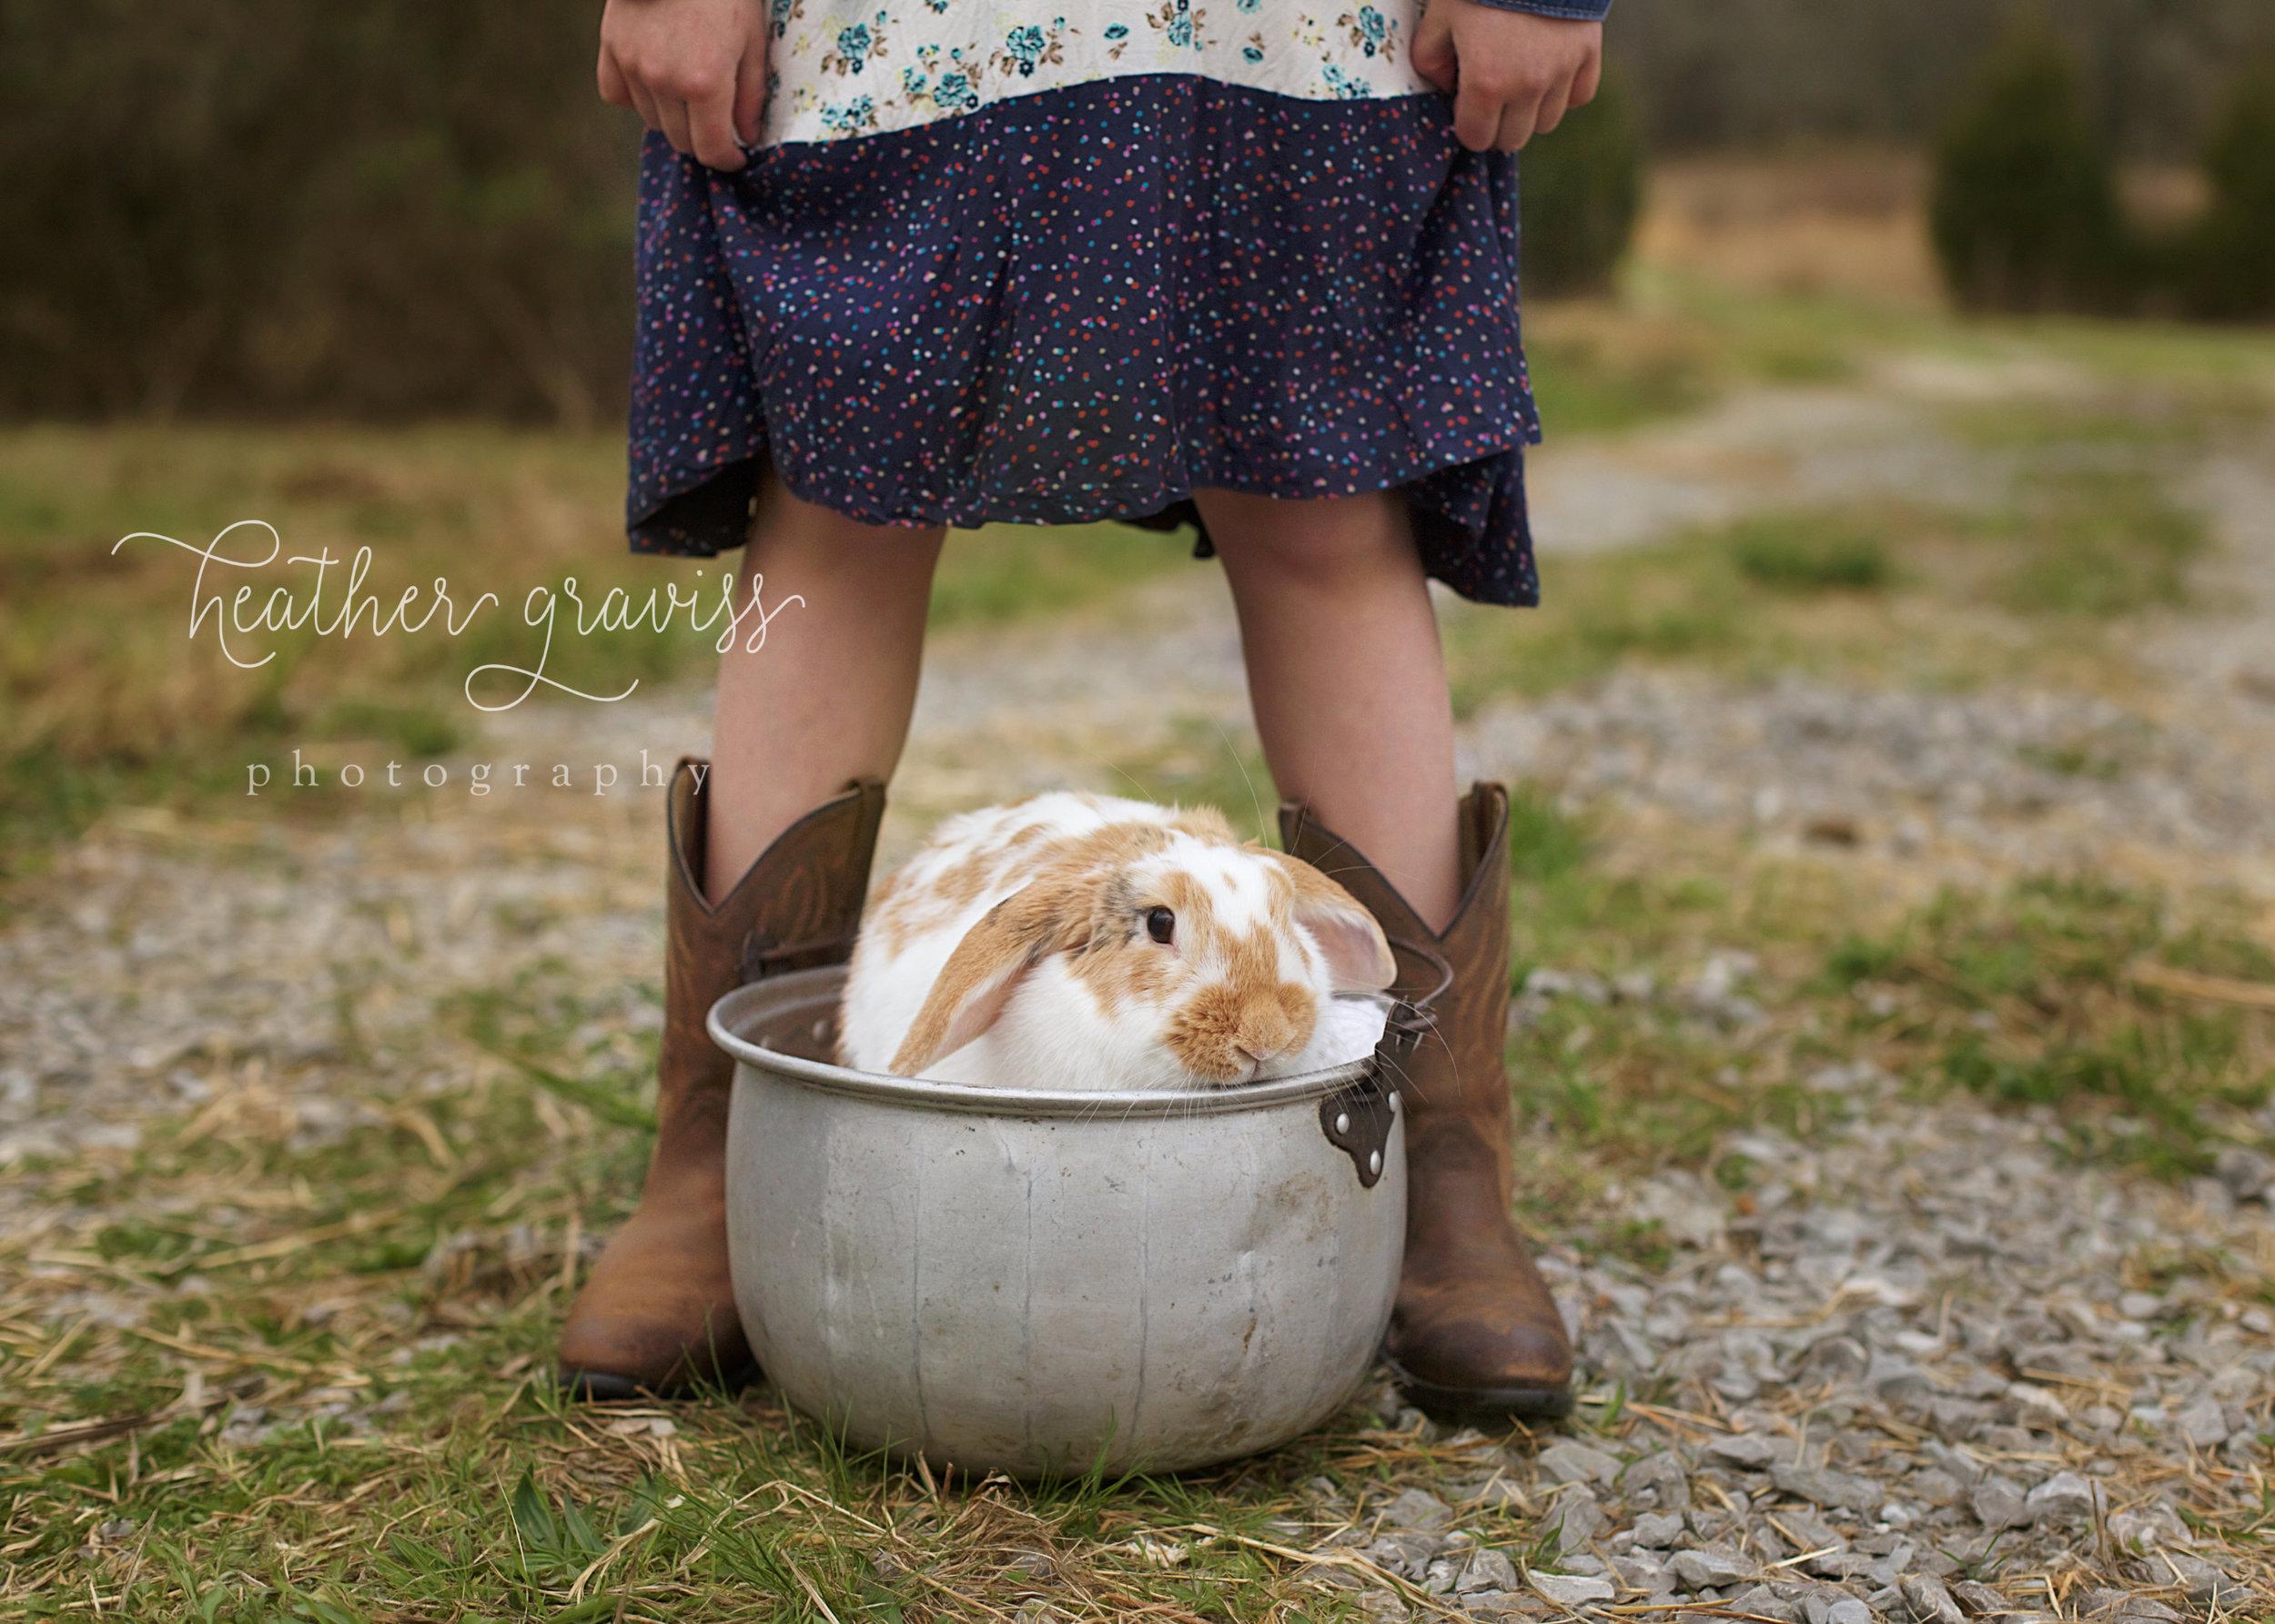 bunny-in-a-bucket.jpg